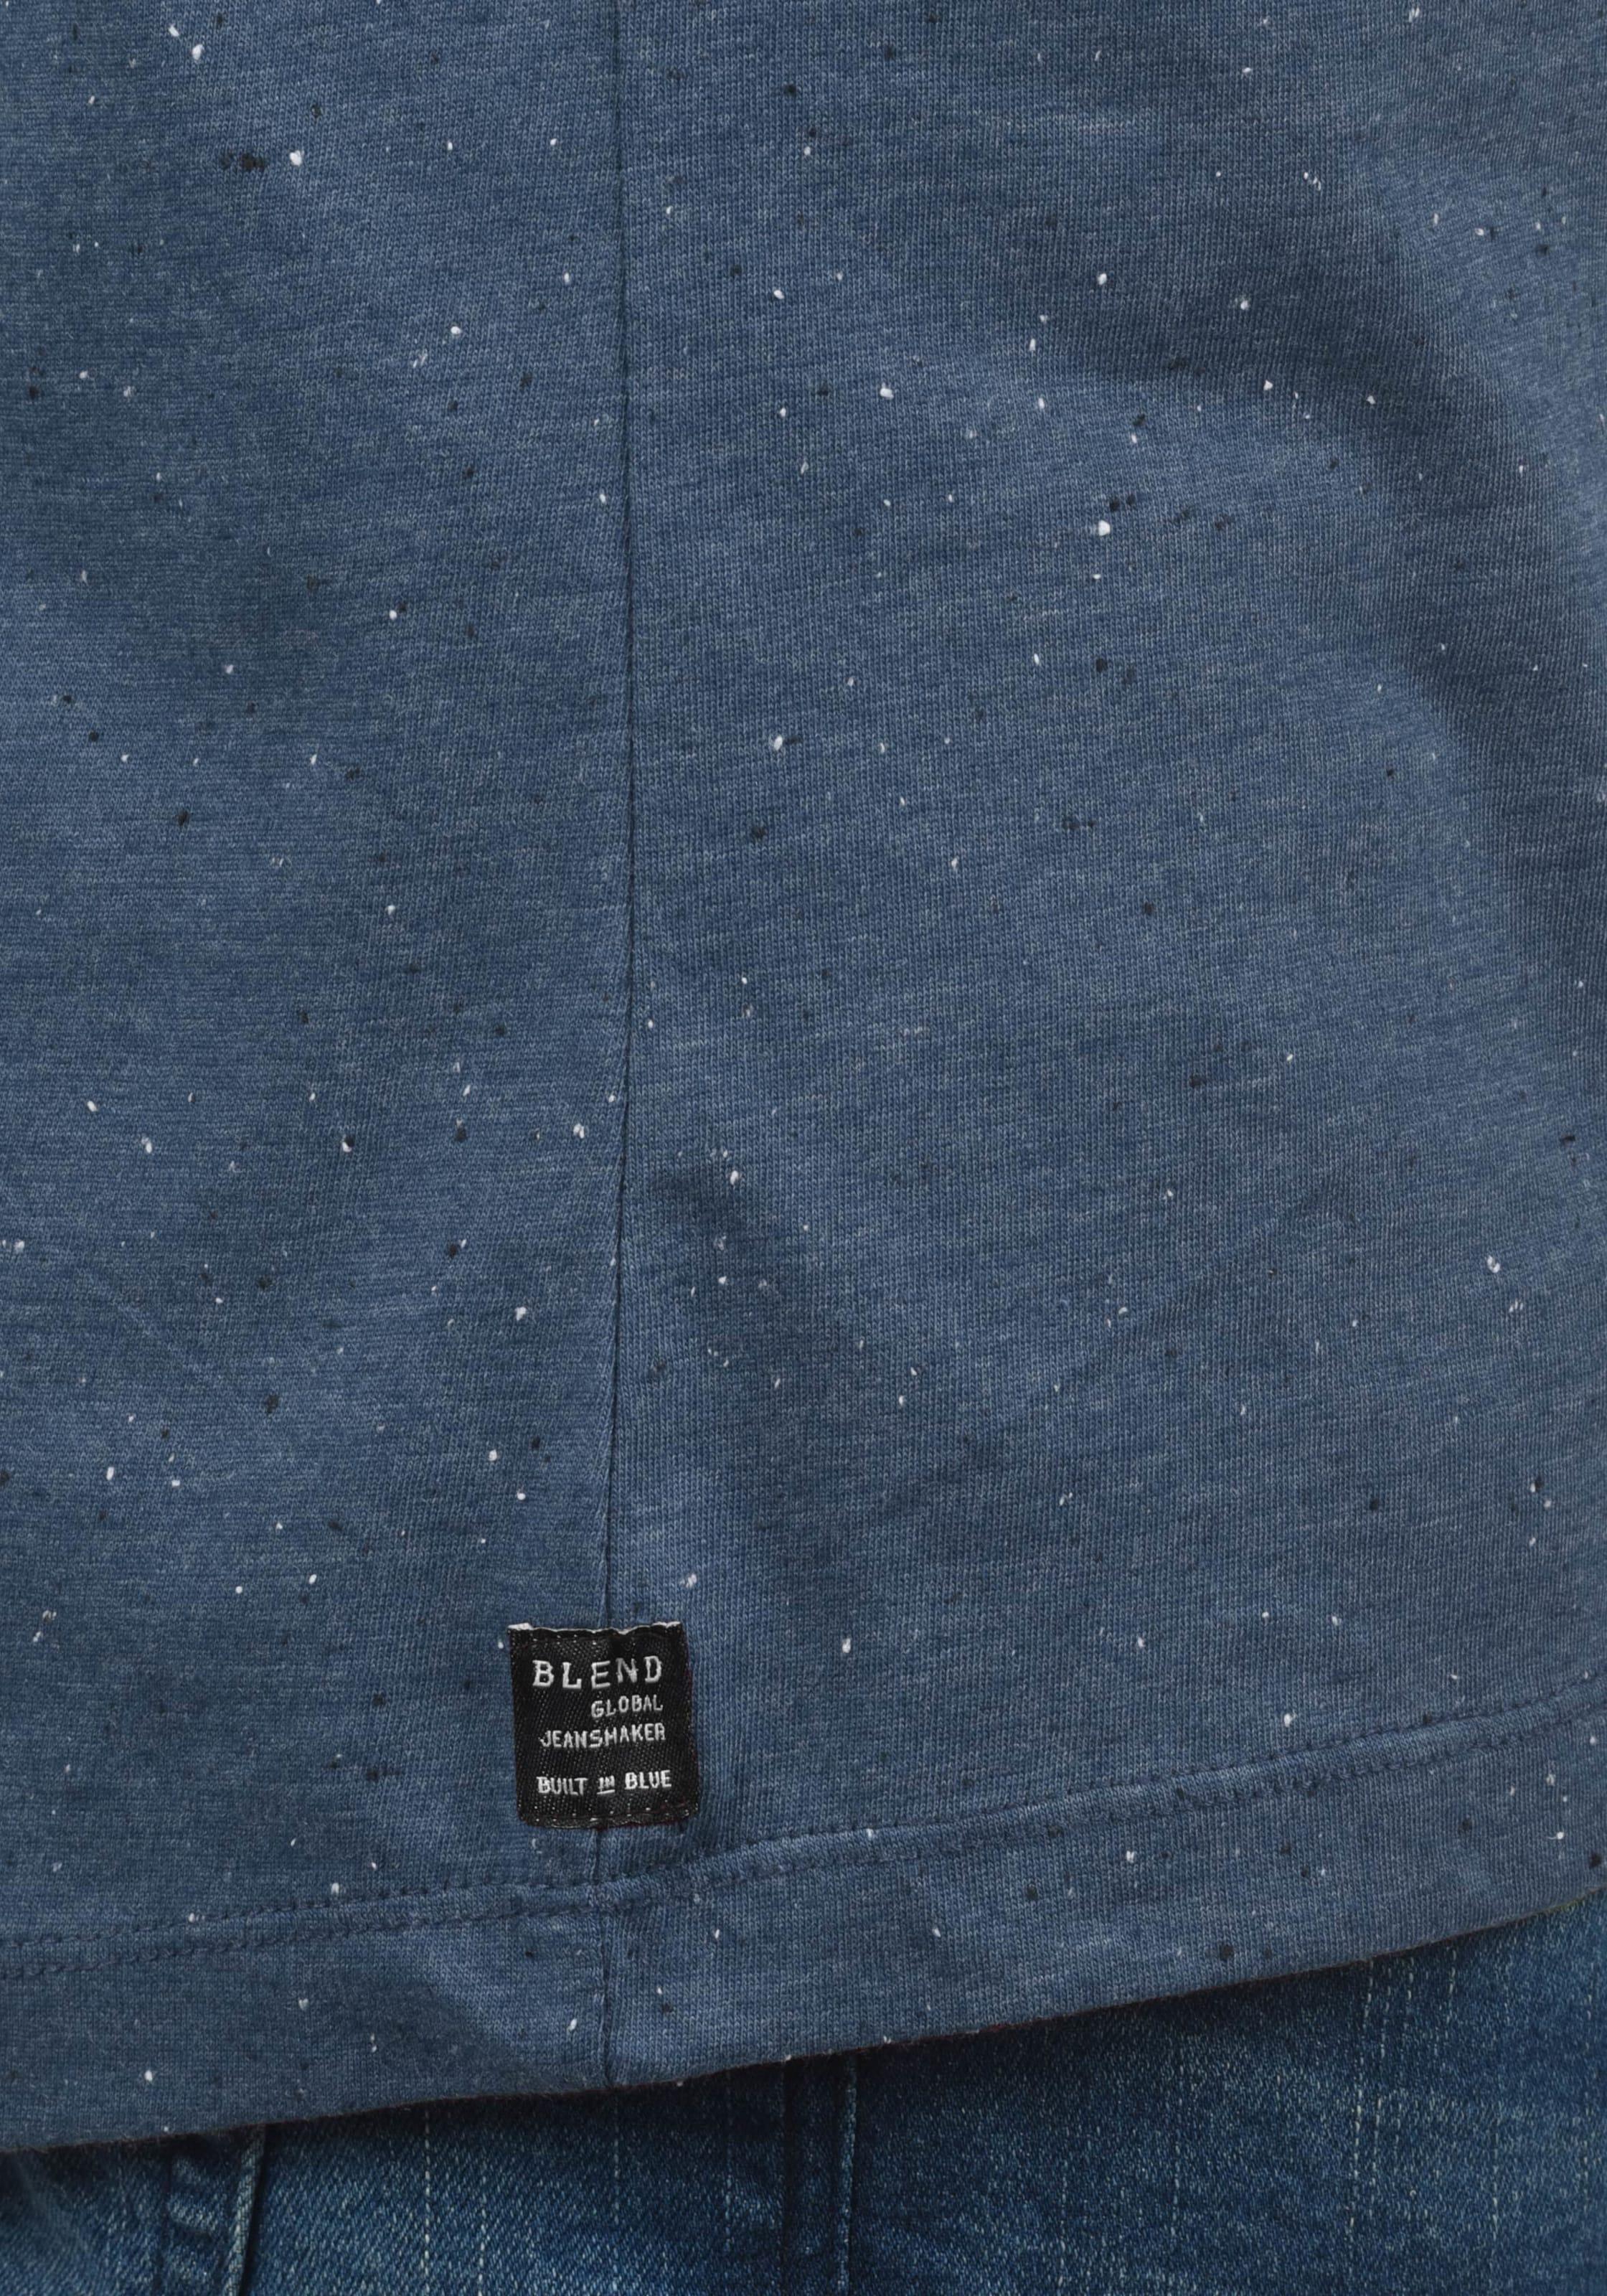 Blend Rundhalsshirt Blau In 'napito' 8k0PnwO